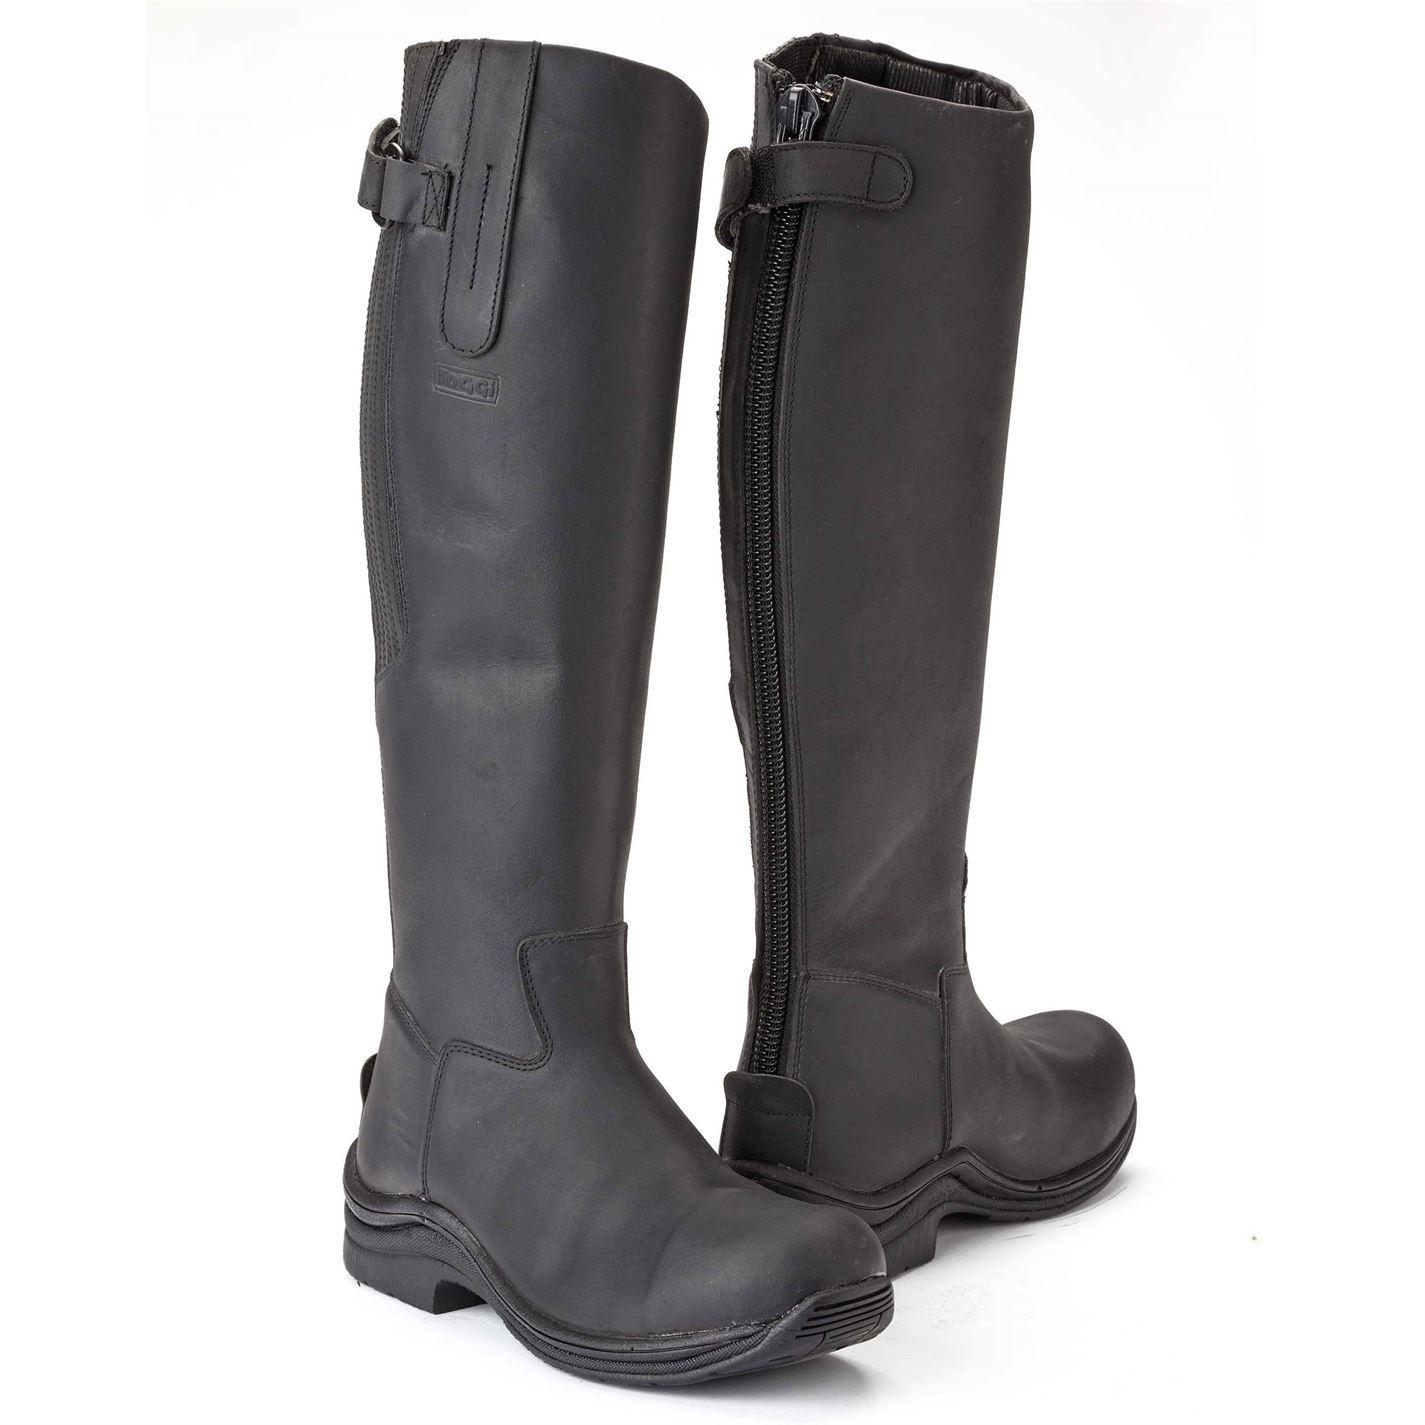 Toggi damen Calgary Long Riding Stiefel schuhe Waterproof Waterproof Waterproof Equestrian Robinsons New bb40a2